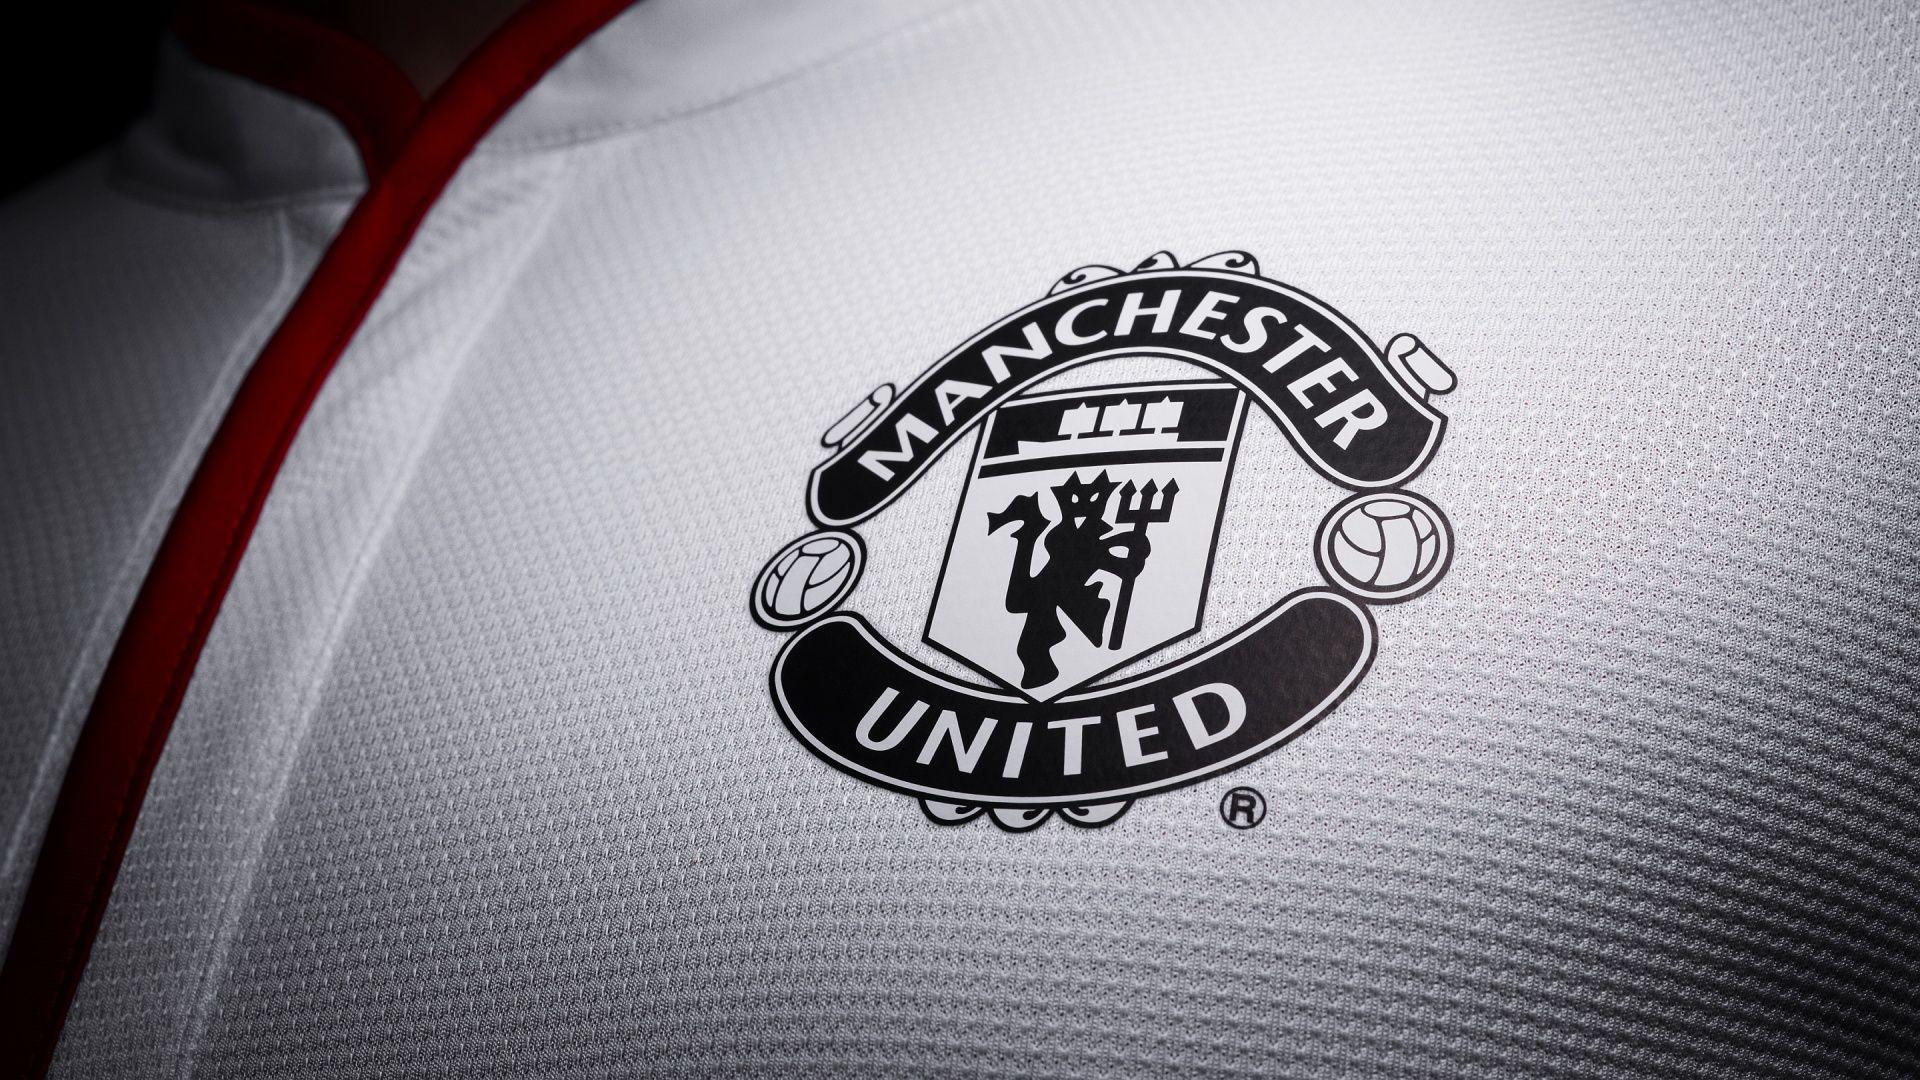 Manchester United HD Wallpaper PC #13200 Wallpaper | Risewall.